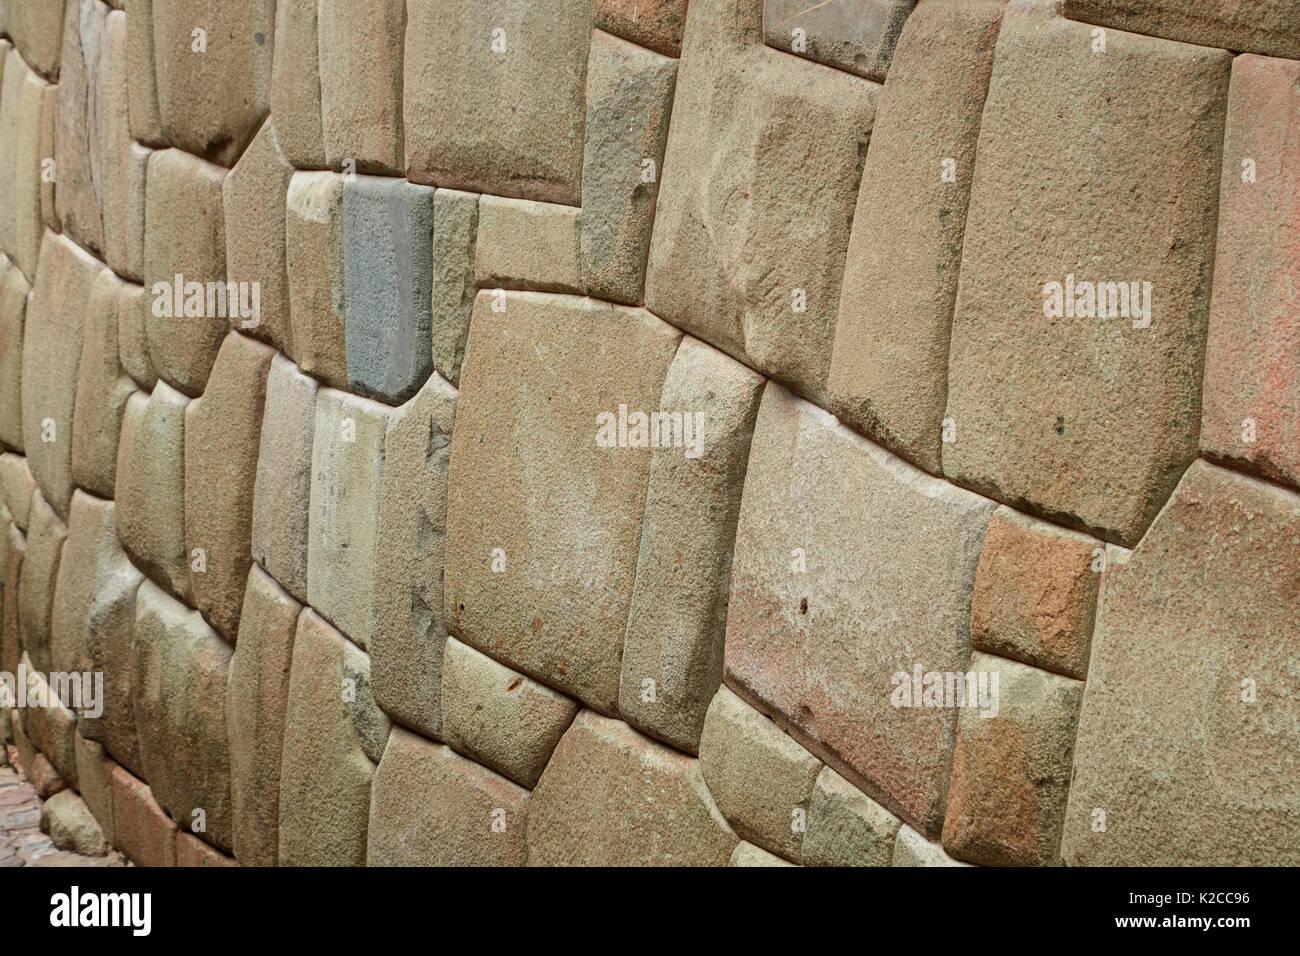 Historic Inca stonework, Inca Roca, Cusco, Peru, South America - Stock Image